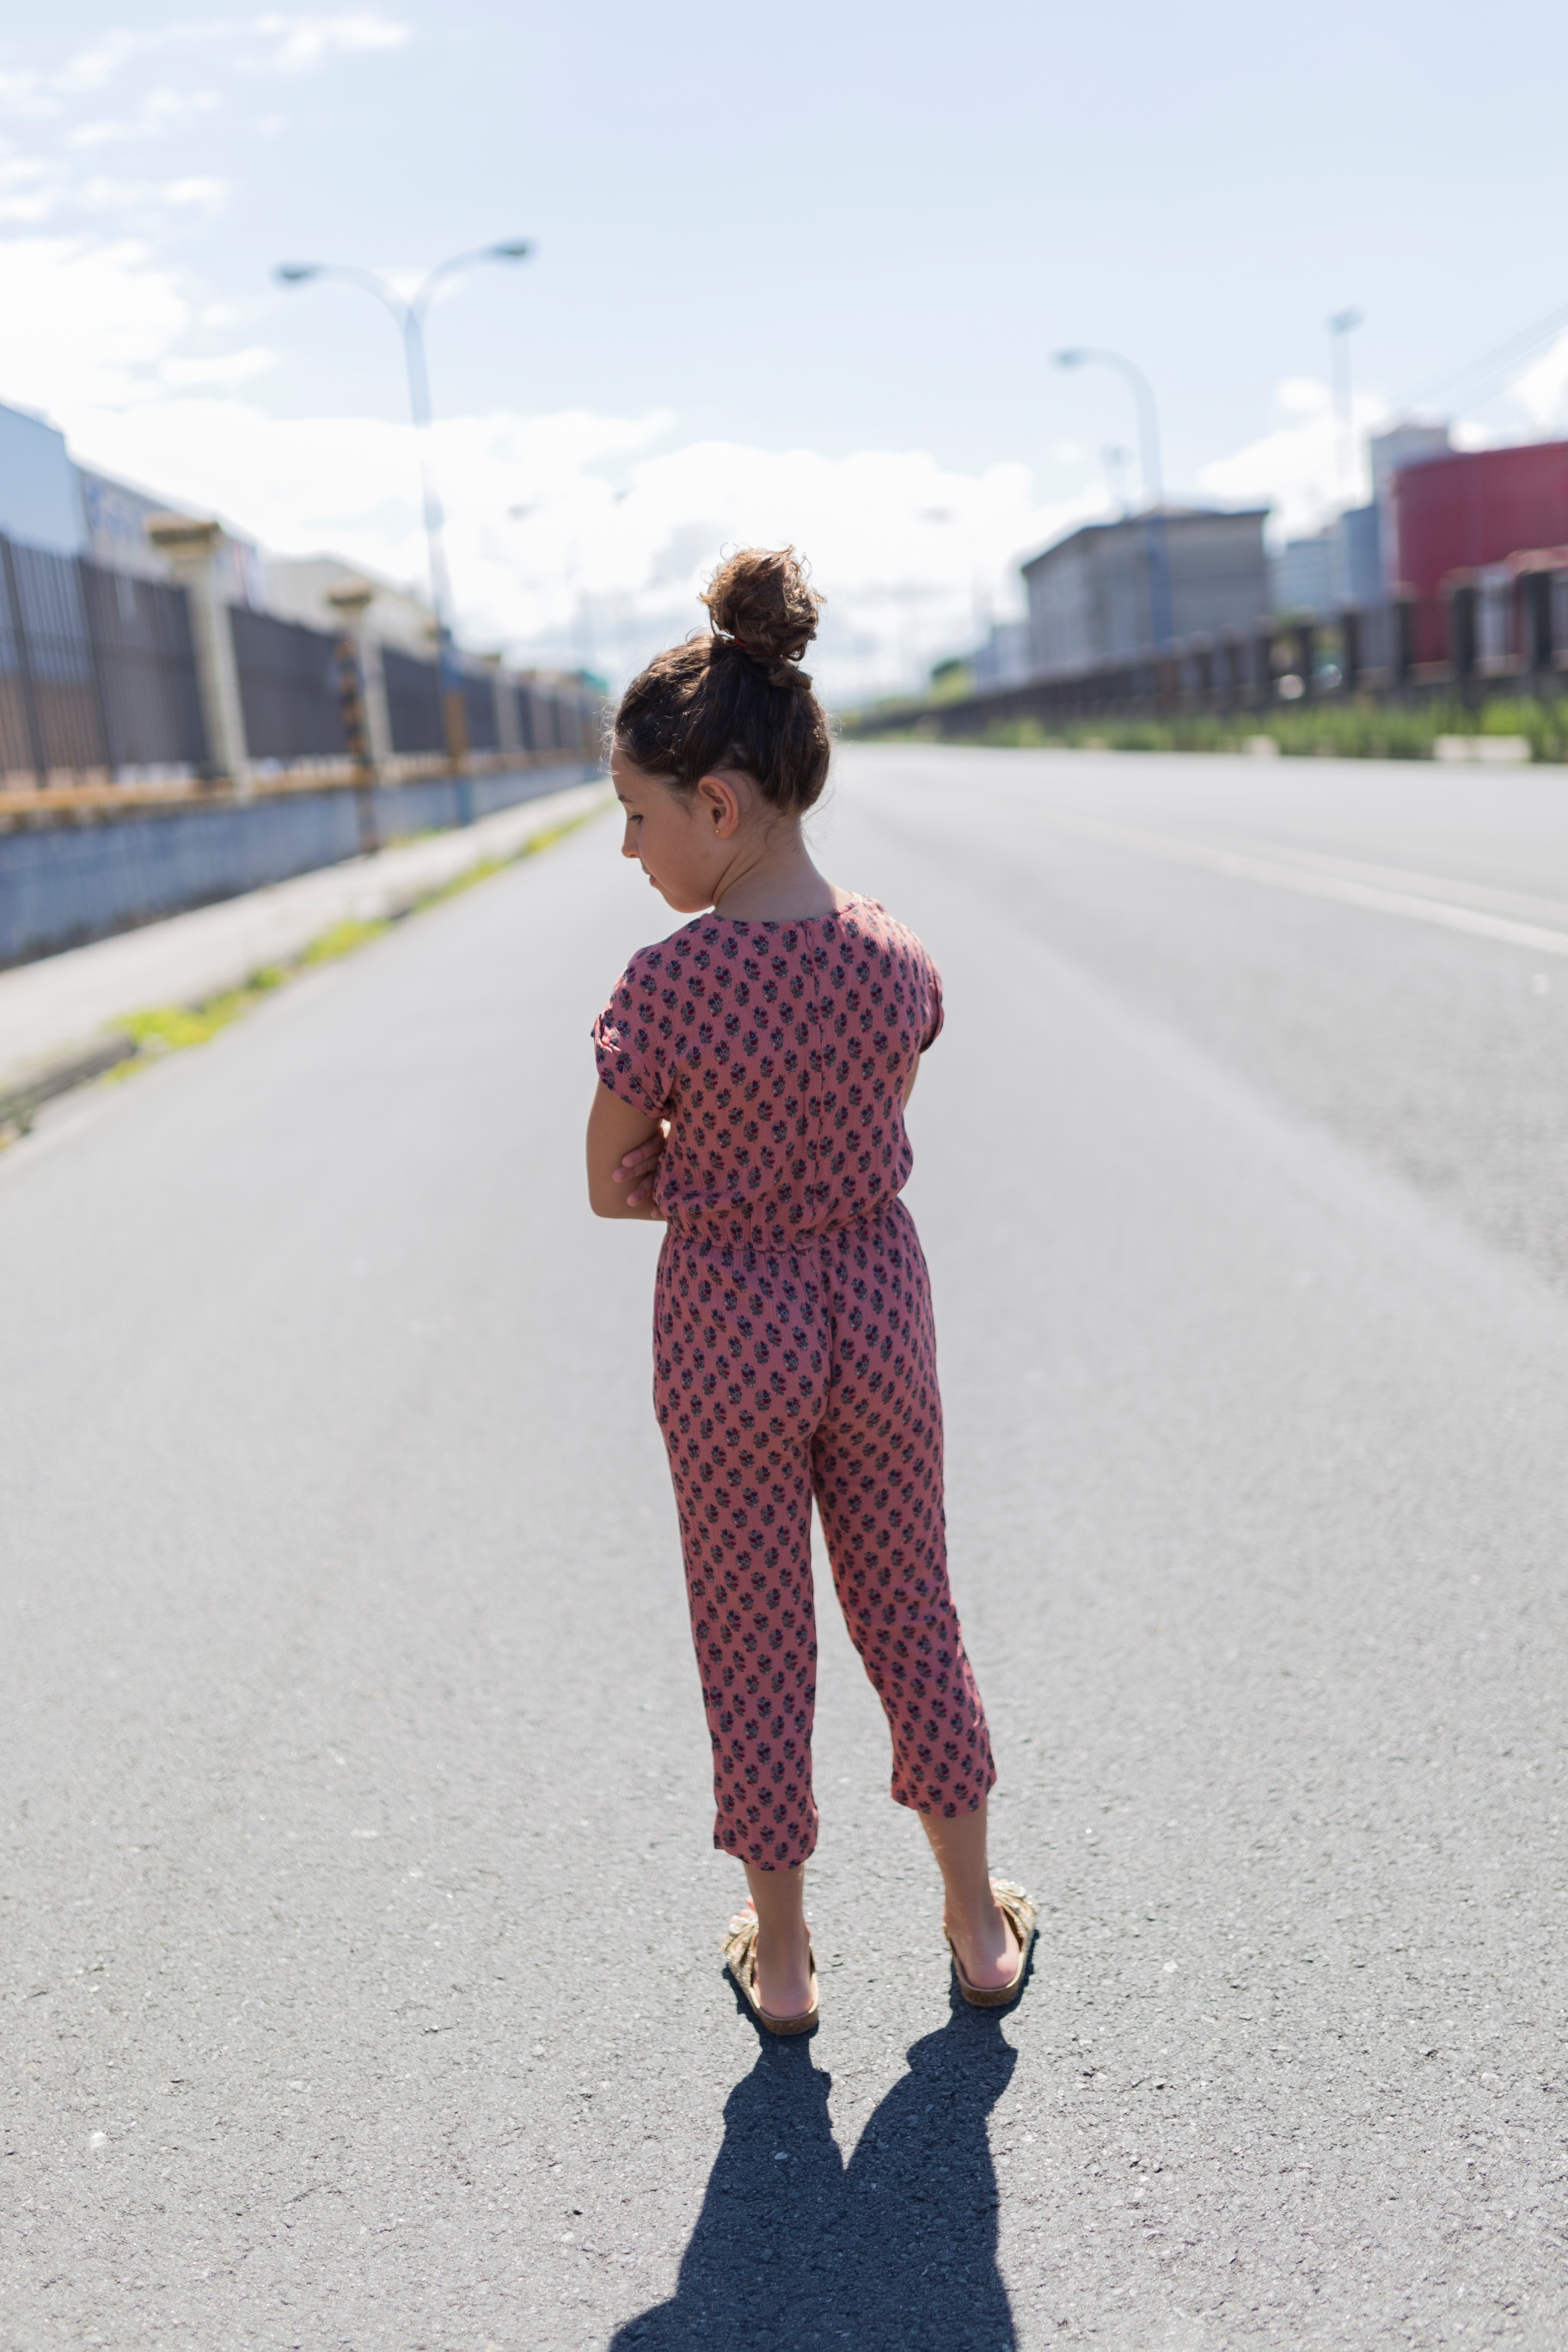 coruña- jimena look- kids- miniblogger- ministyle- Soft- streetstyle- zara- zara kids- zara soft-descalzaporelparque- moda-niños-fashion kids